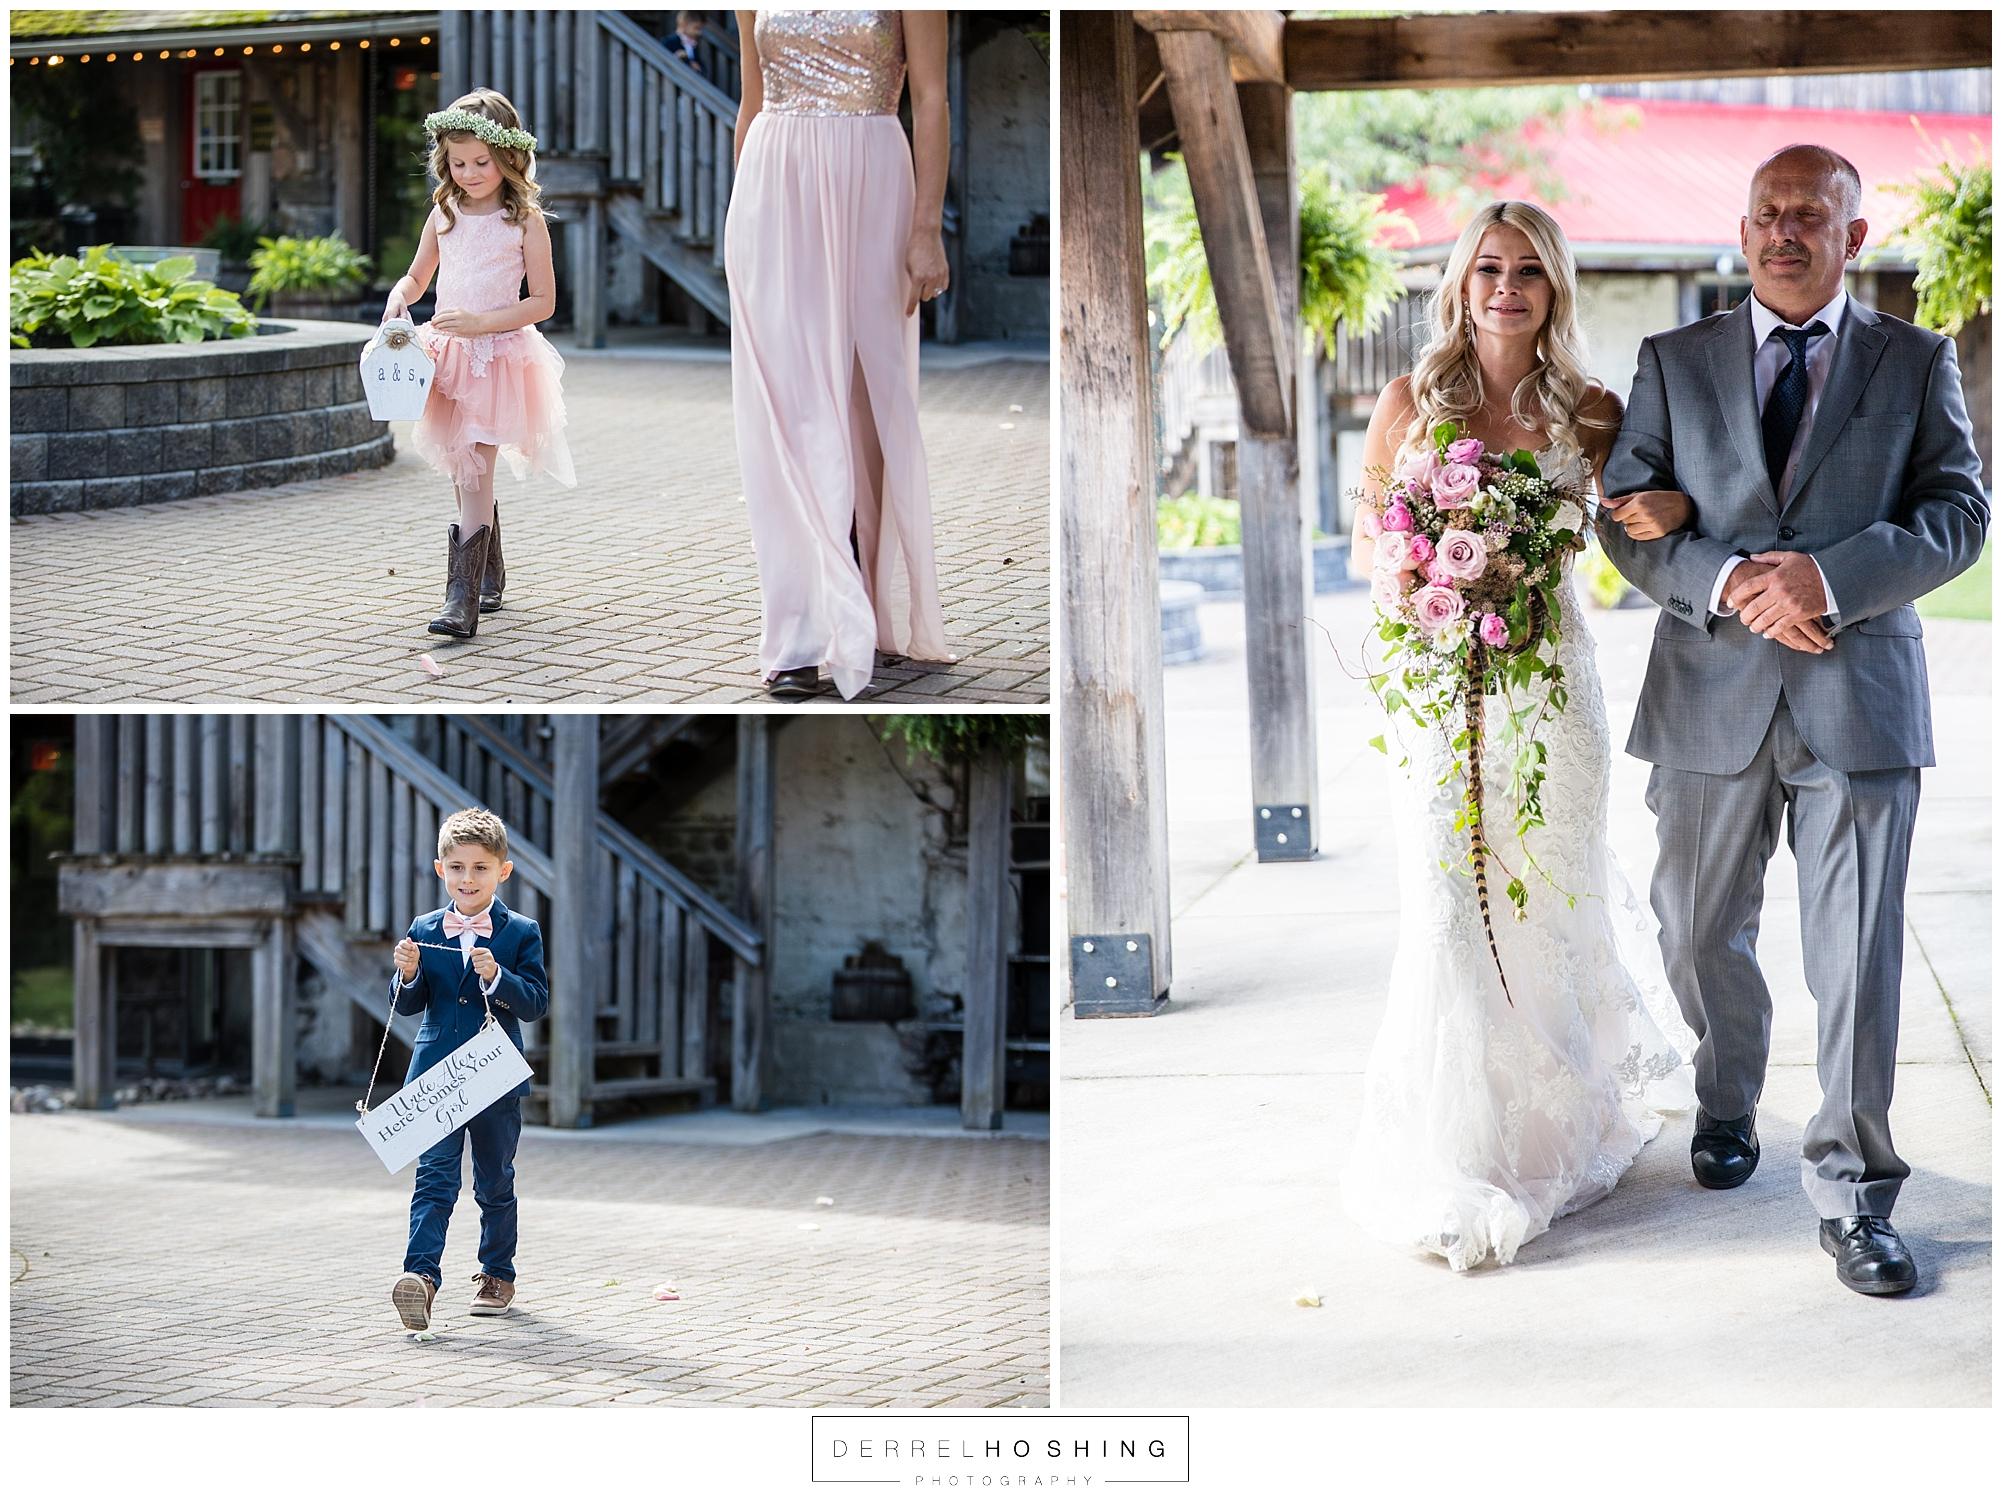 Belcroft-Estates-&-Event-Centre-Wedding-Innisfil-Ontario-0008.jpg